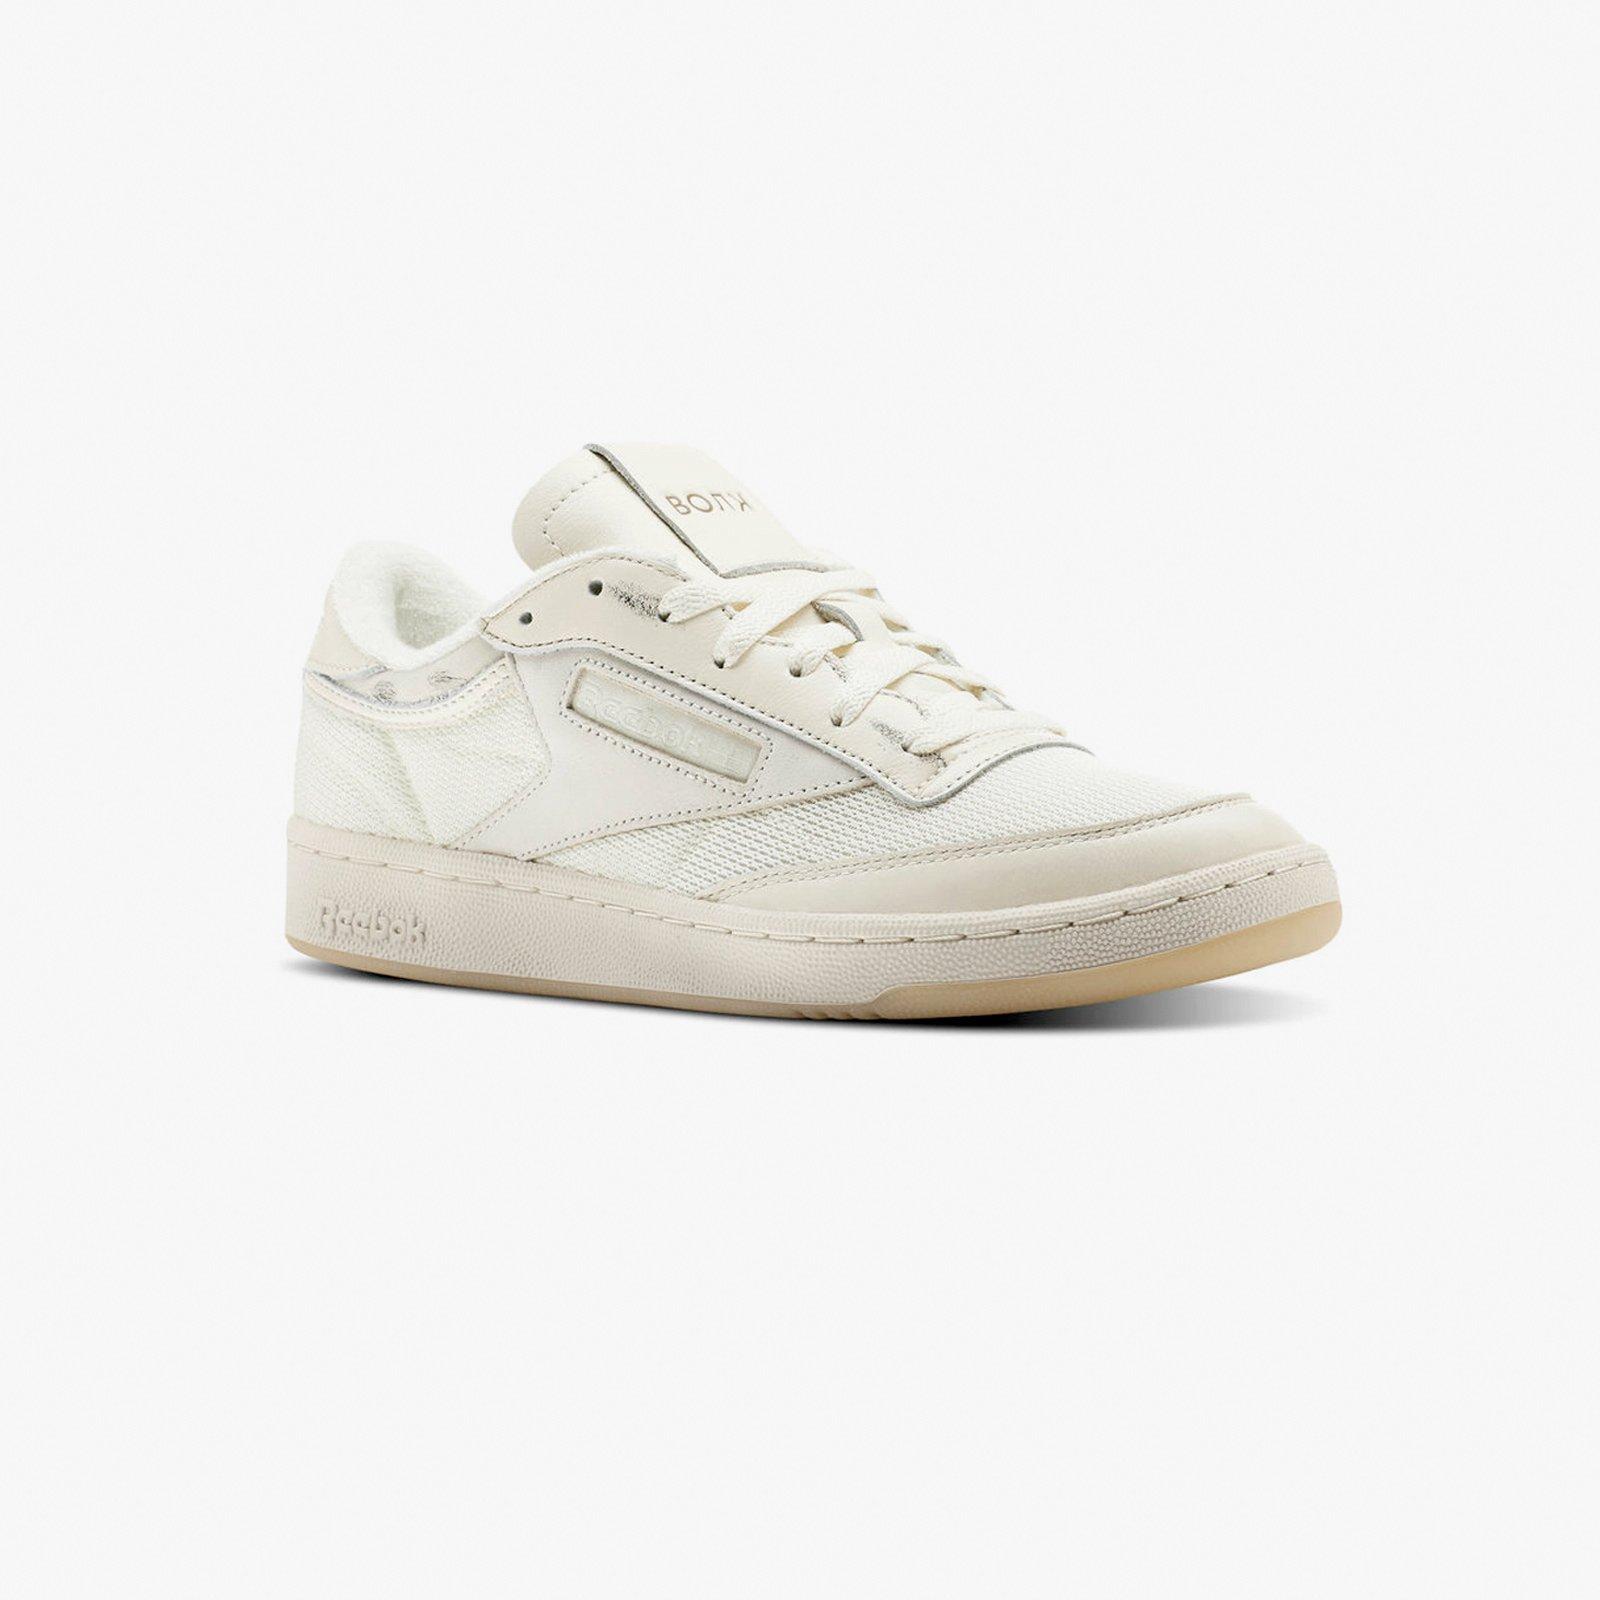 Reebok Club C 85 x Walk Of Shame Cn6982 Sneakersnstuff